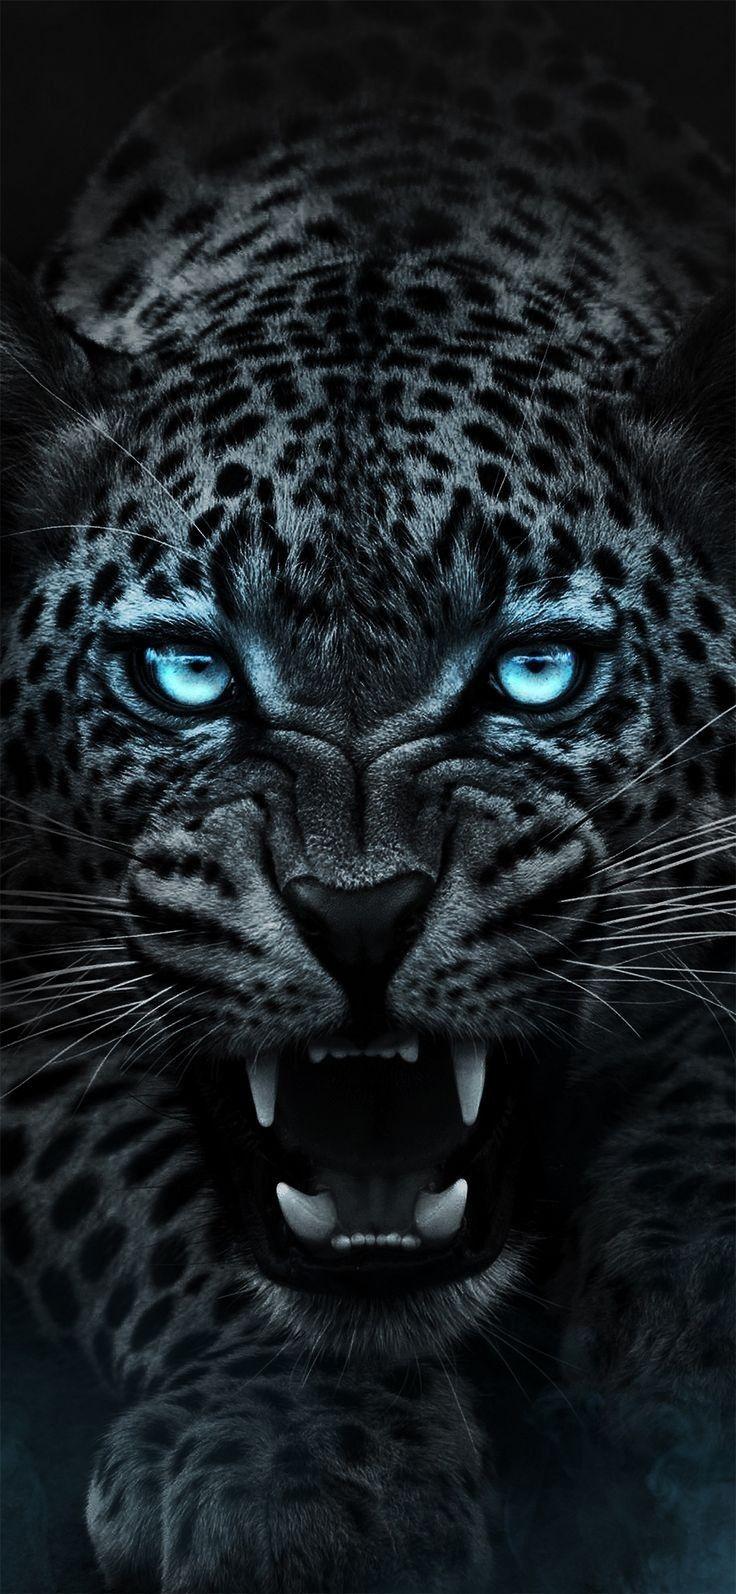 The Amazing Leopard Wild Animal Wallpaper Tiger Wallpaper Jaguar Animal